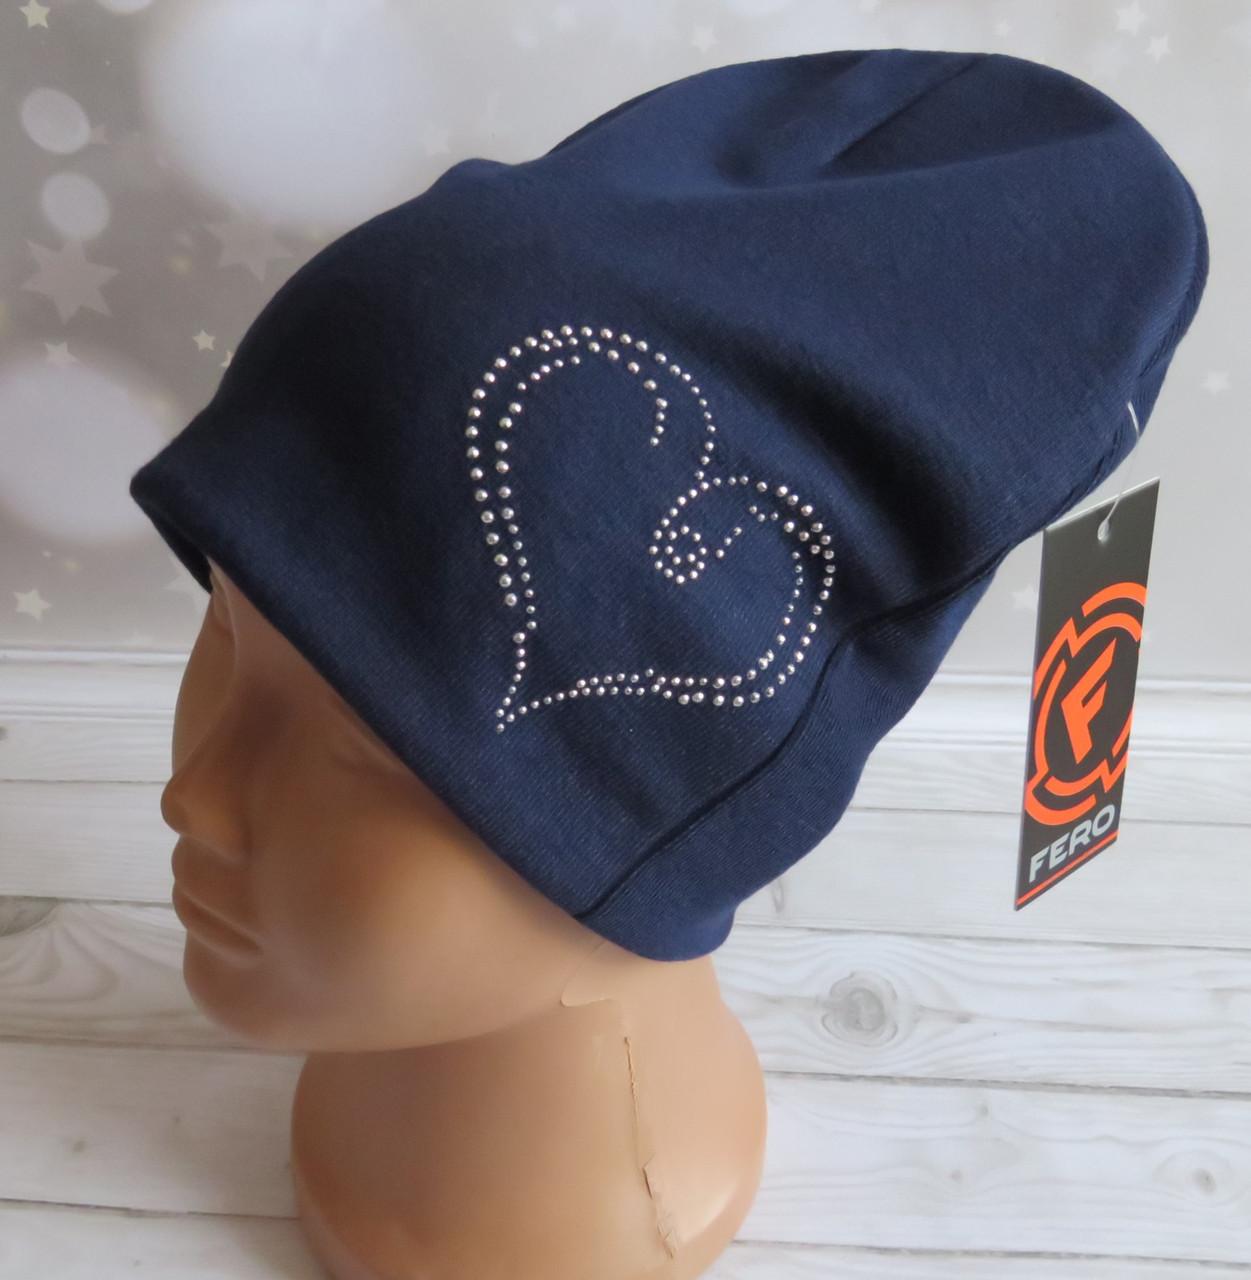 Молодіжна шапка трикотажна Nord Среце зі стразами, синя